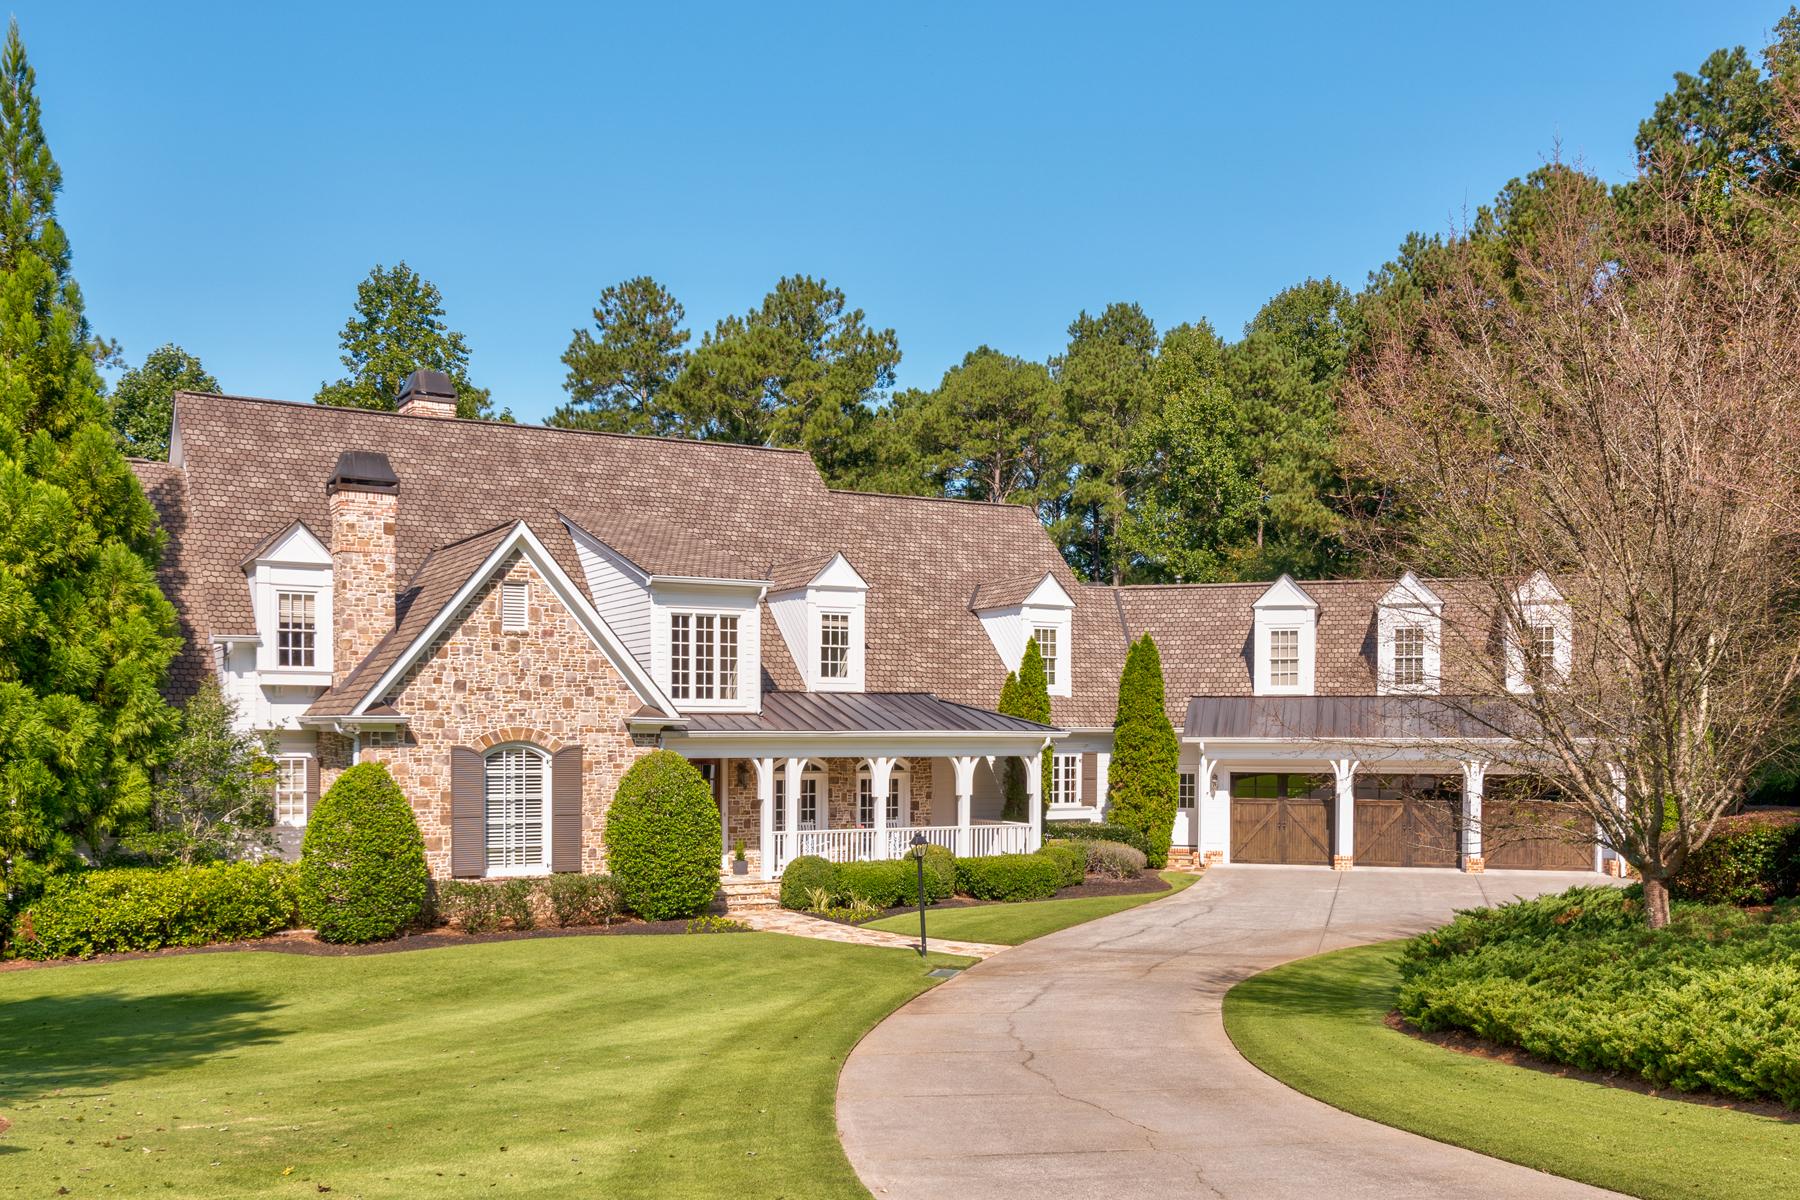 Casa Unifamiliar por un Venta en Picture Perfect In White Columns 790 Golf Vista Court, Milton, Georgia, 30004 Estados Unidos